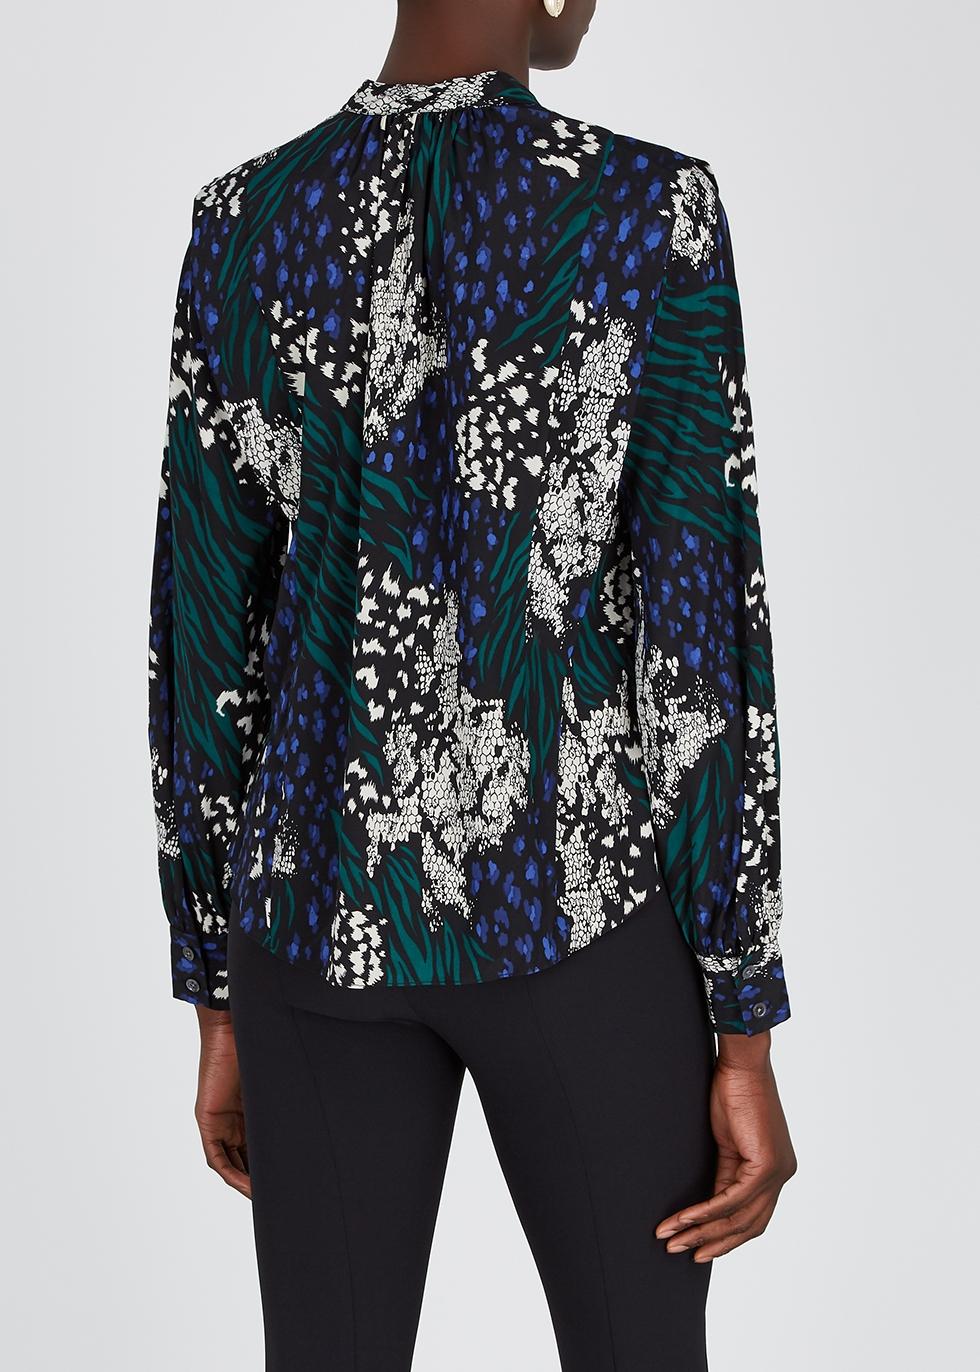 Veronica Beard Buckley printed silk crepe de chine blouse